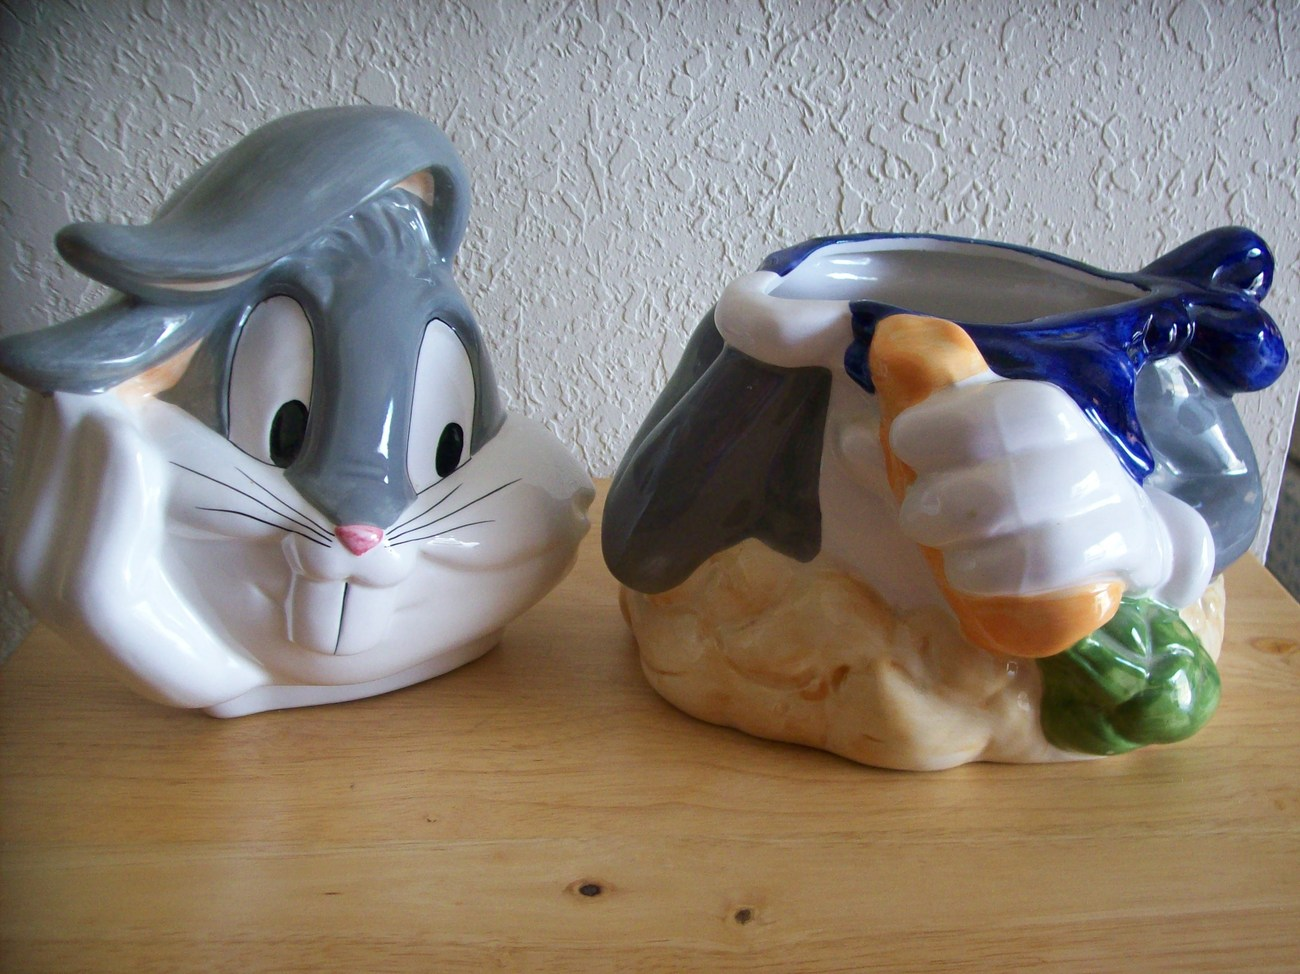 1993 Looney Tunes Bugs Bunny Cookie Jar